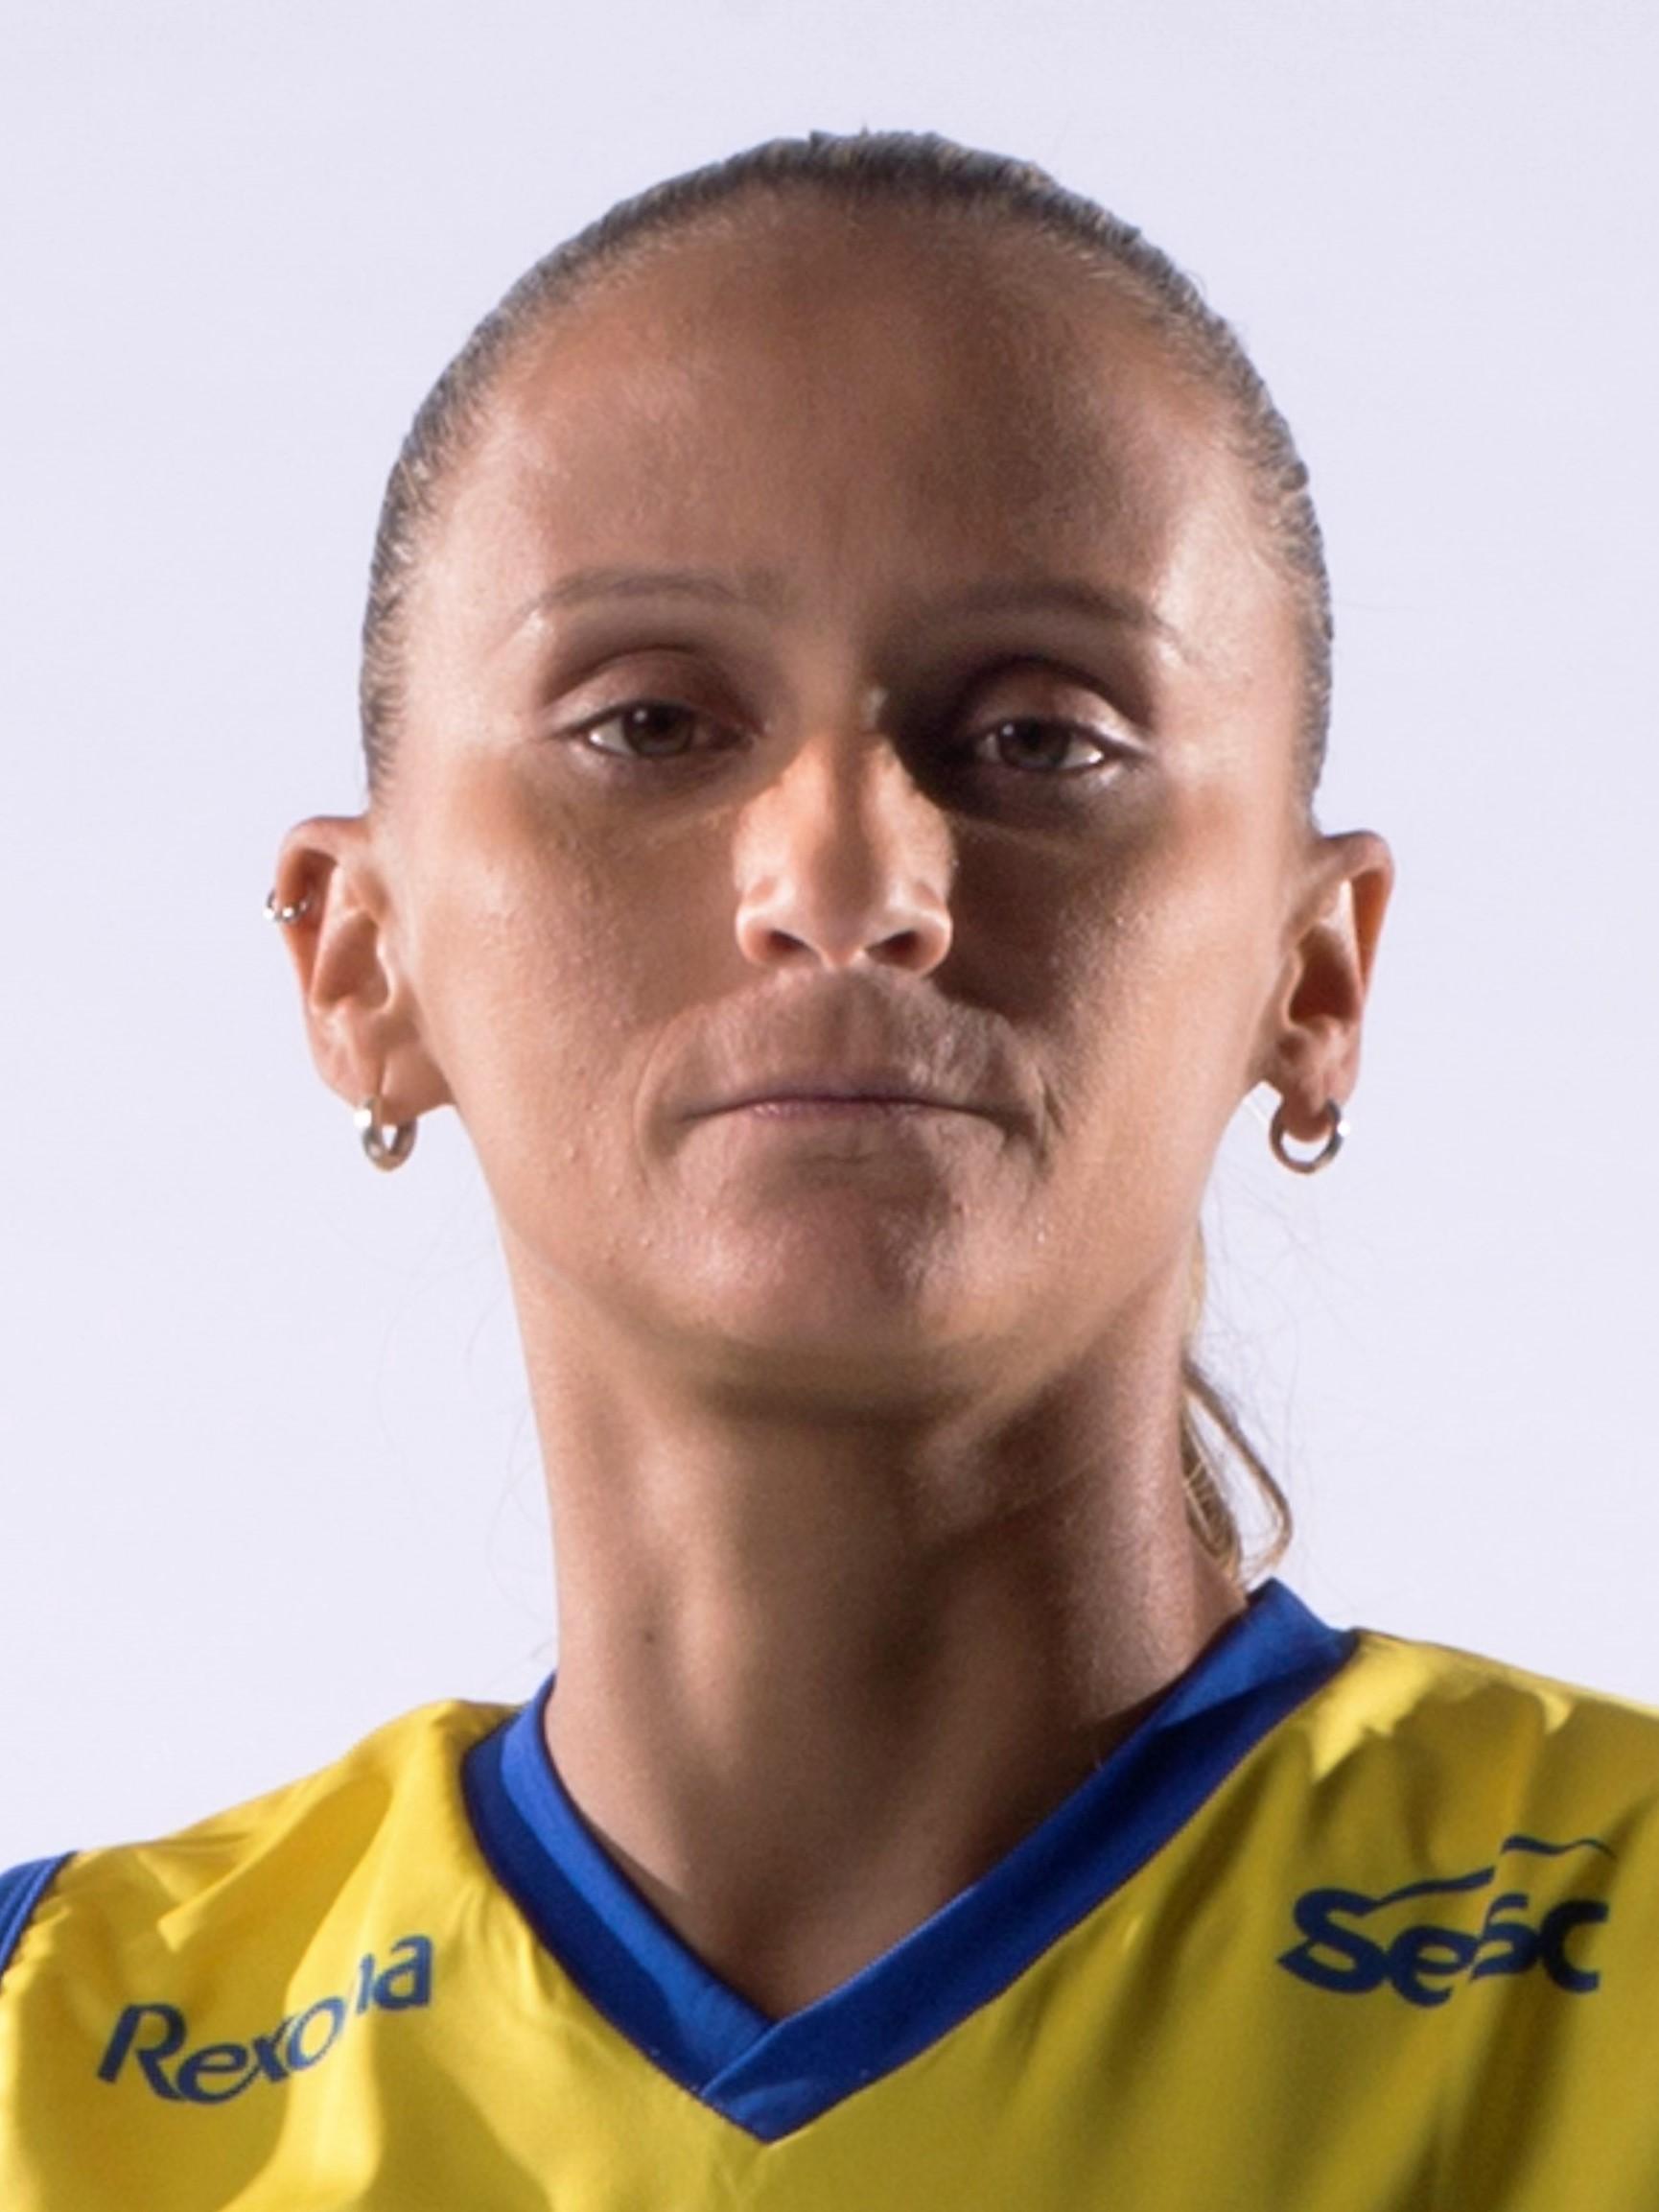 Fabiana Oliveira